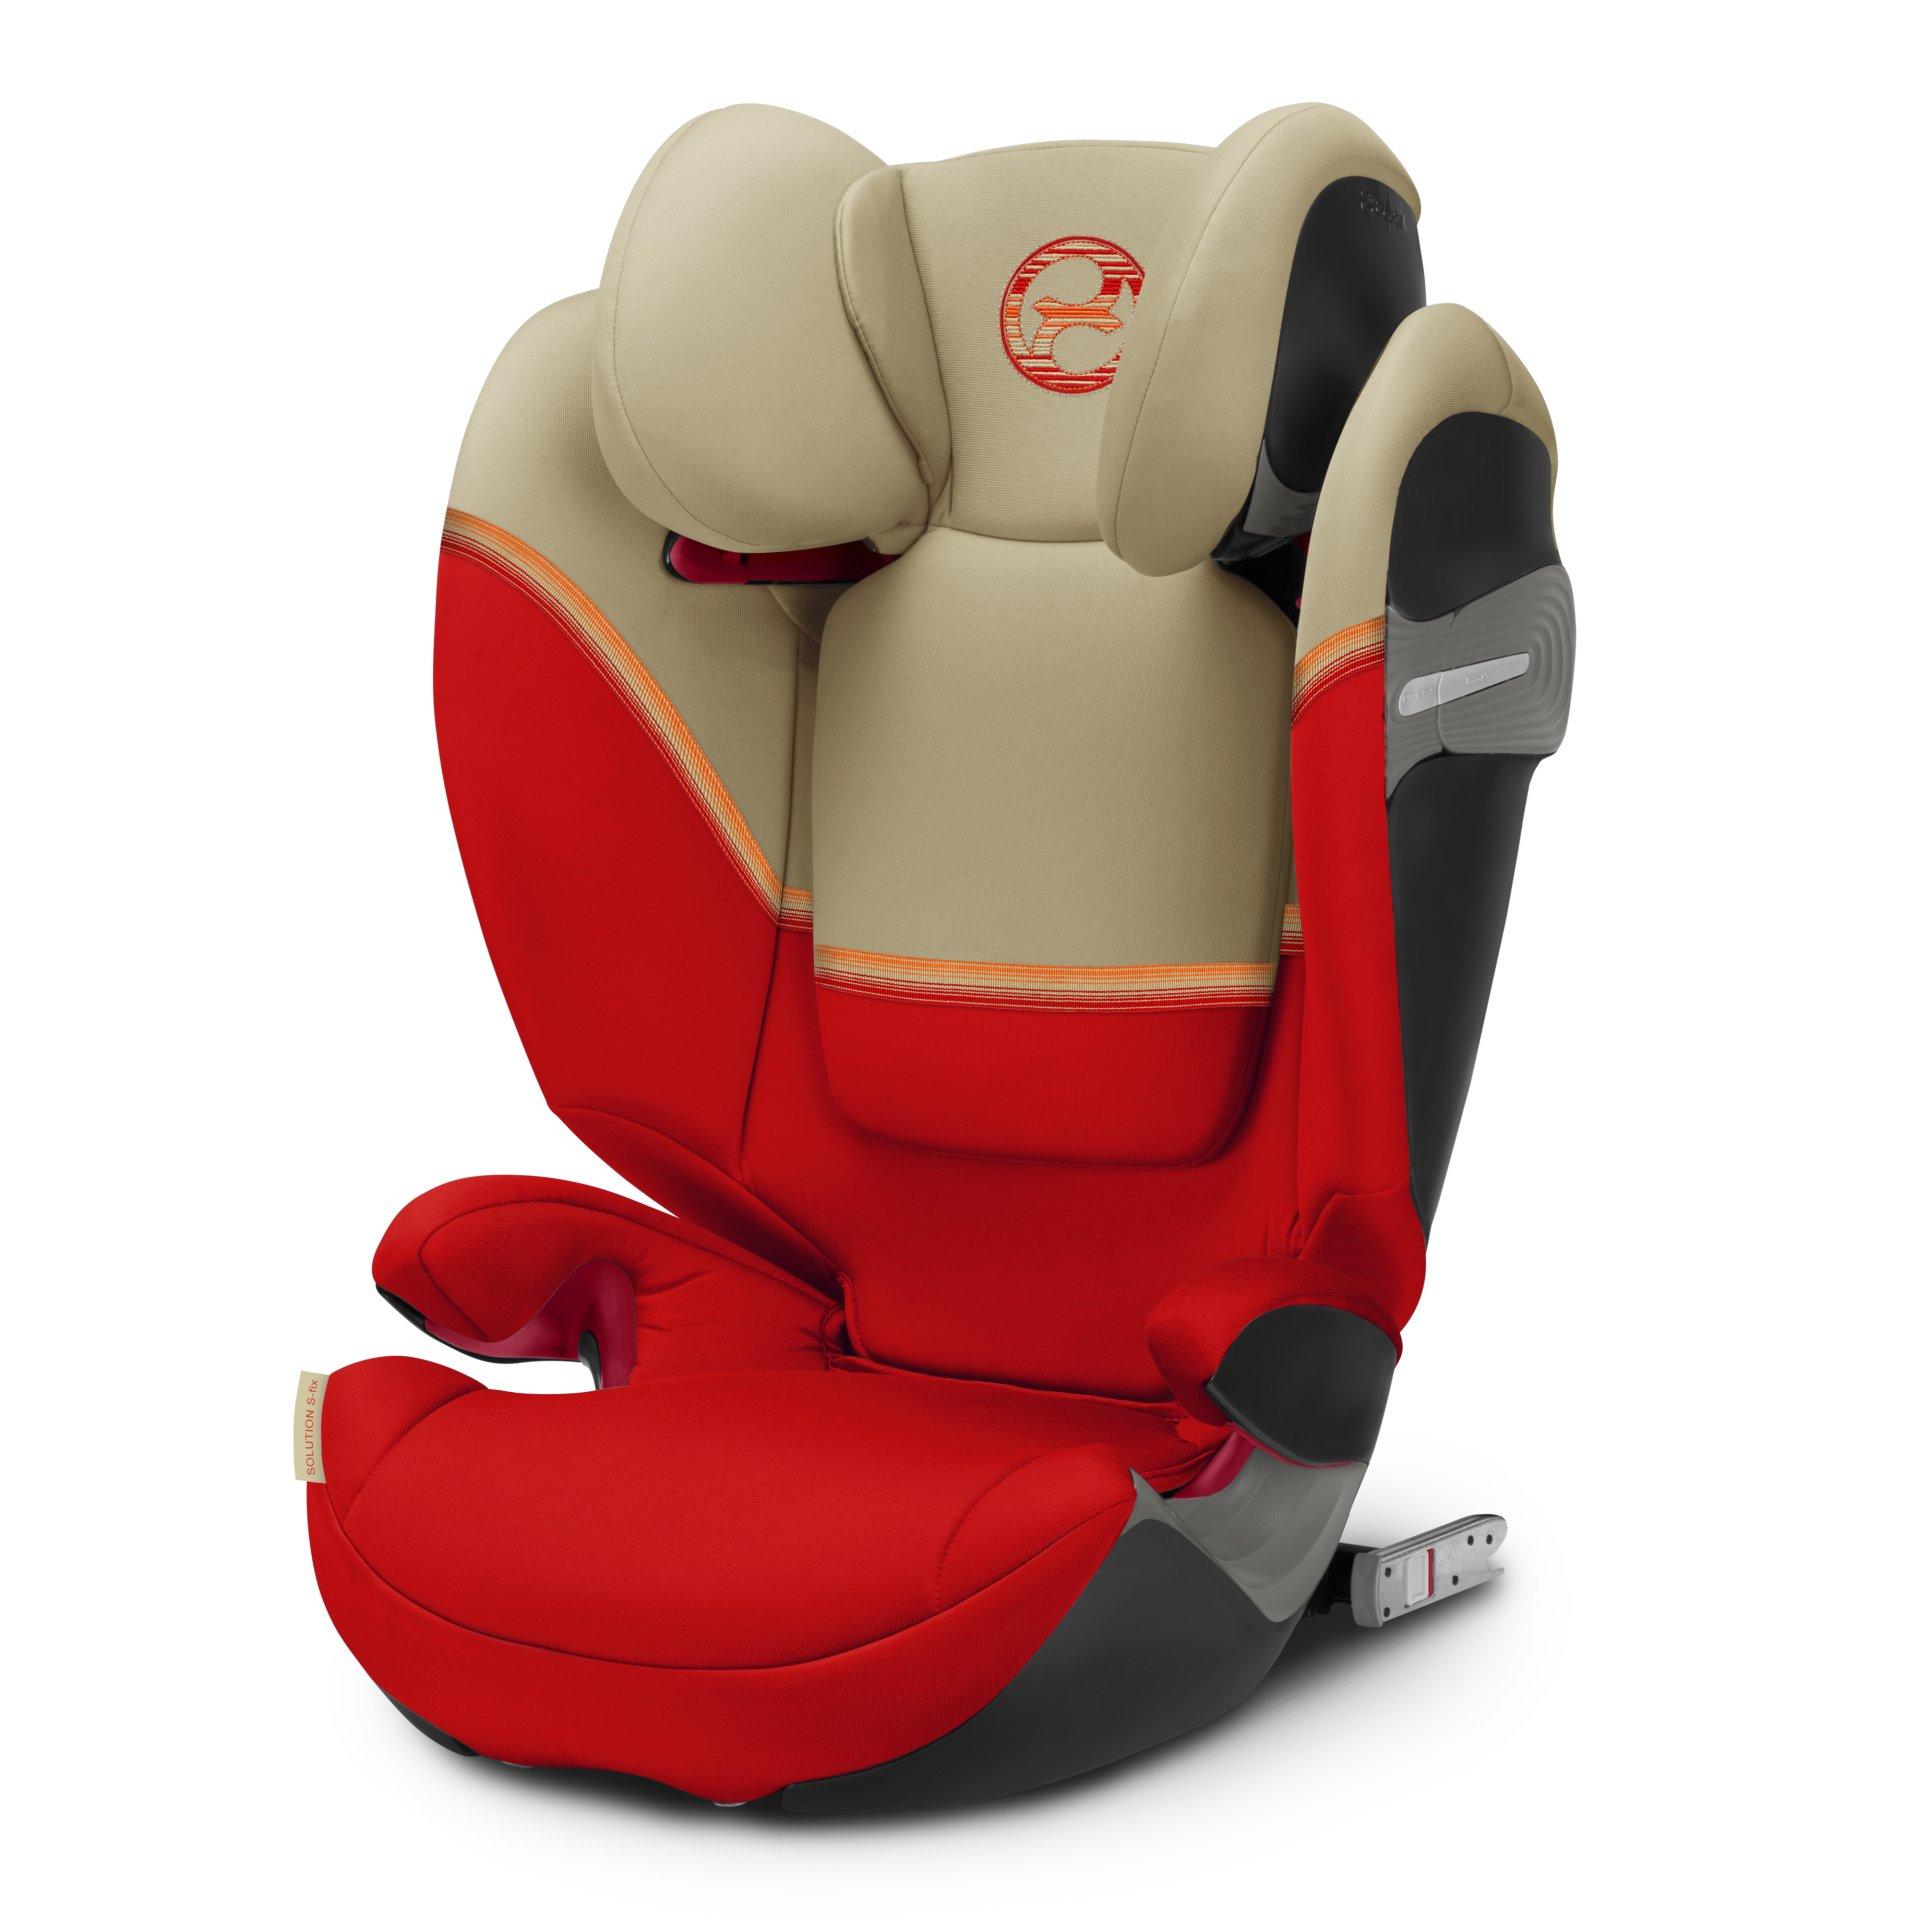 cybex kindersitz solution s fix 2019 tropical blue navy blue online kaufen bei kidsroom. Black Bedroom Furniture Sets. Home Design Ideas